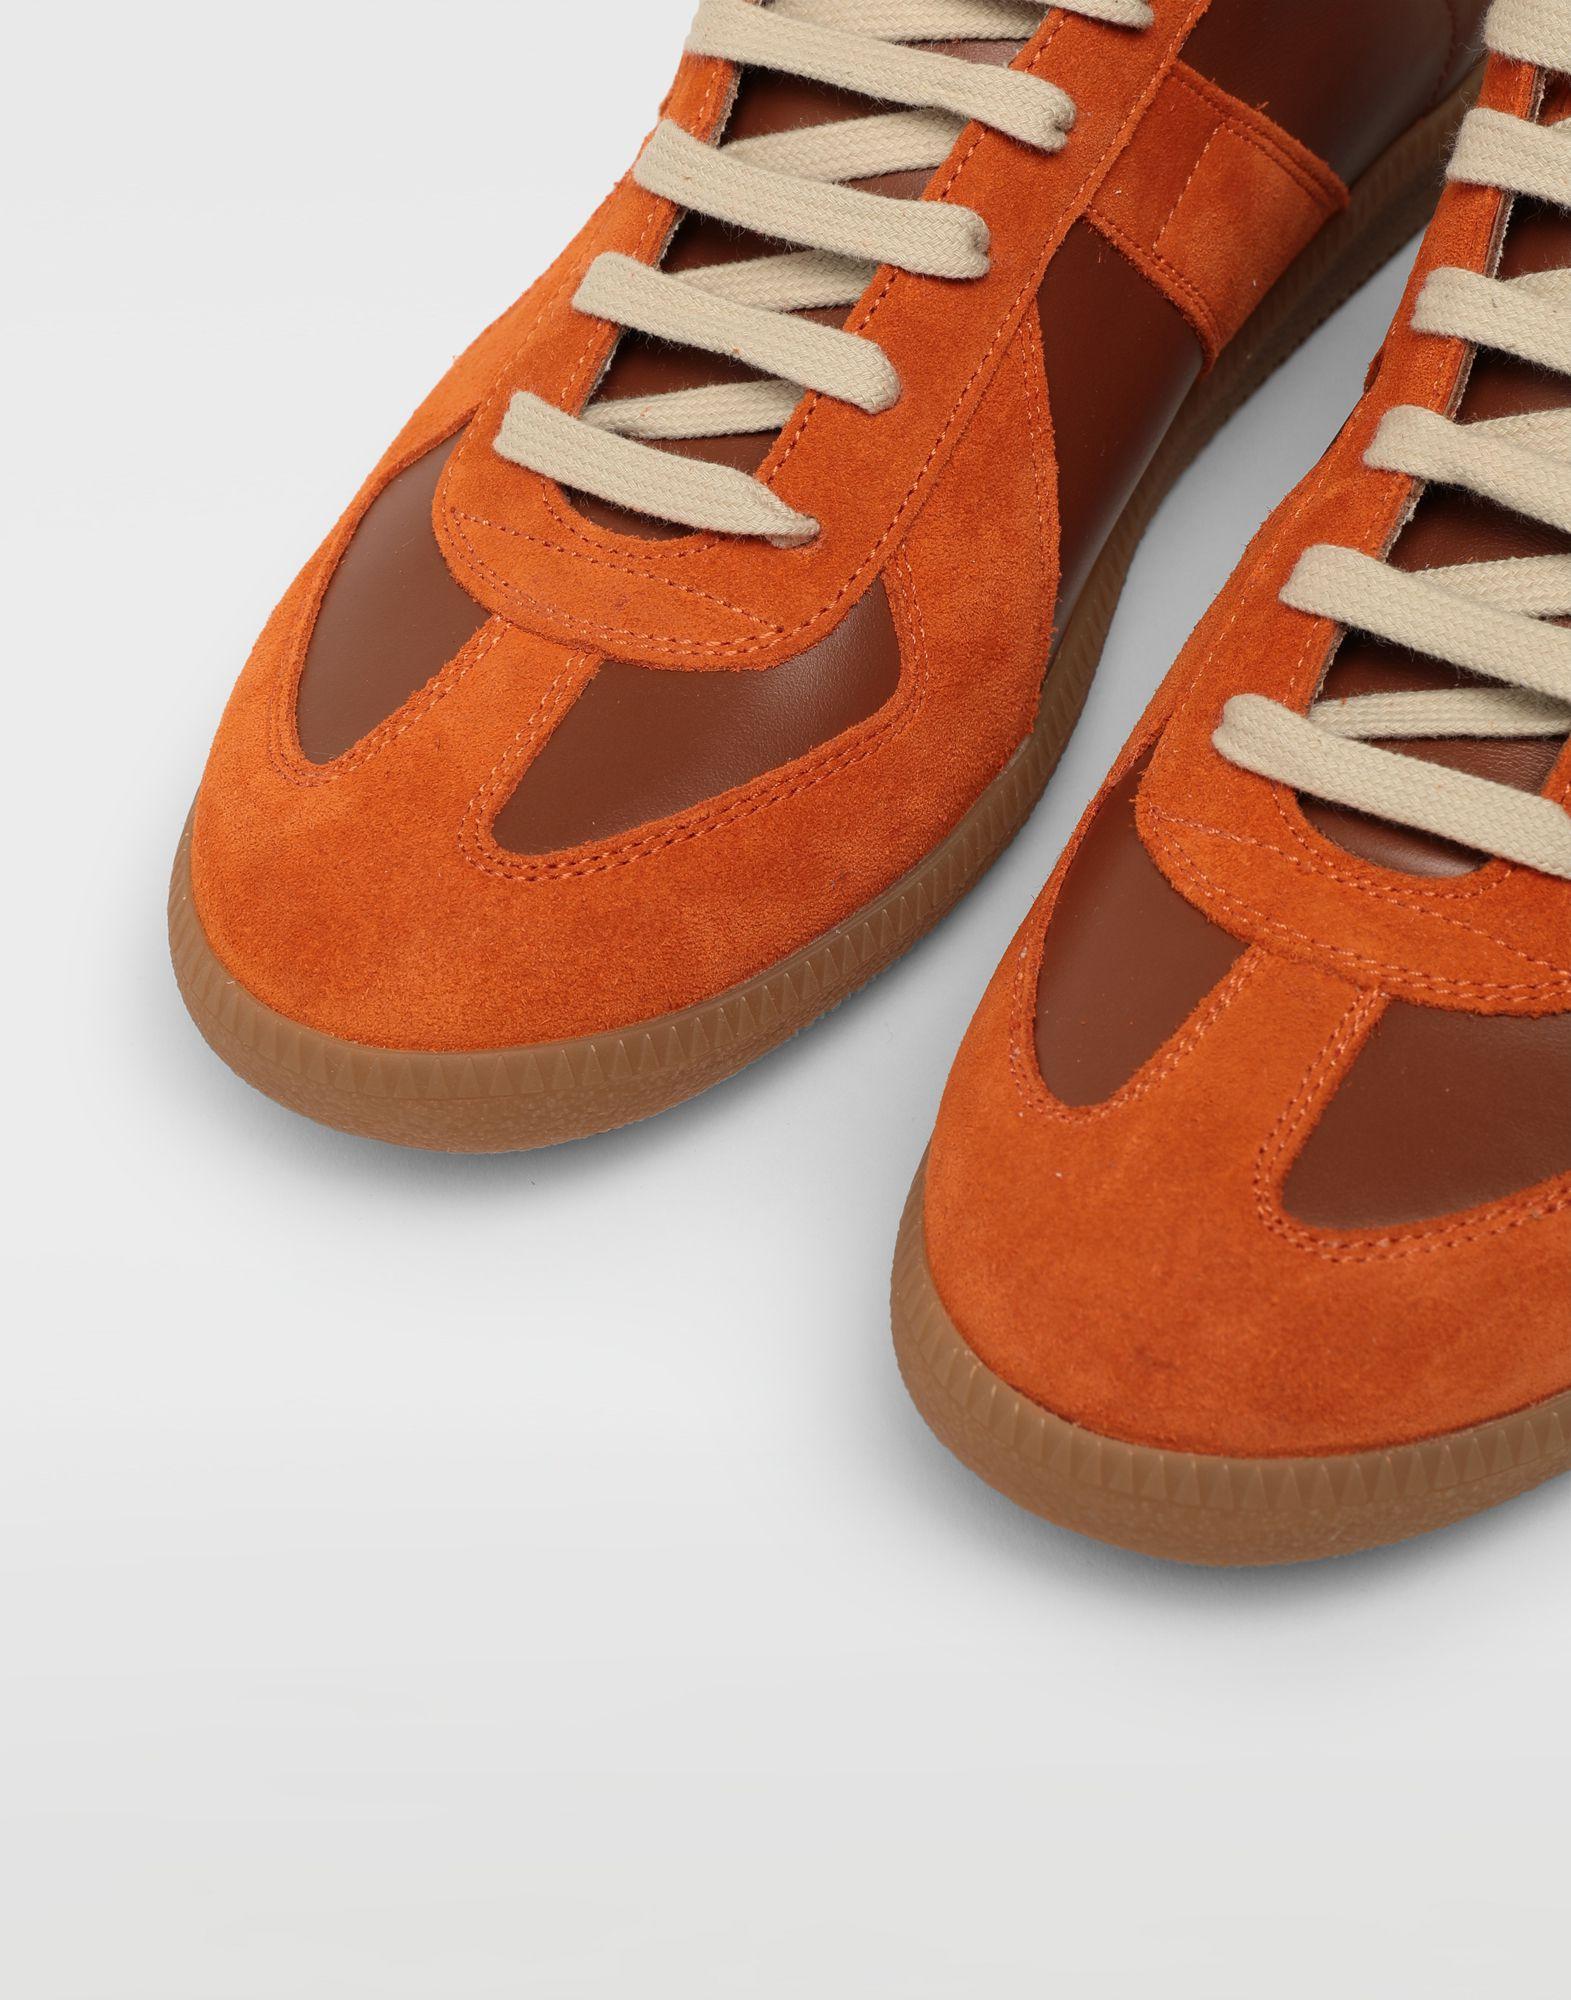 MAISON MARGIELA Replica low top calfskin and suede sneakers Sneakers Man e